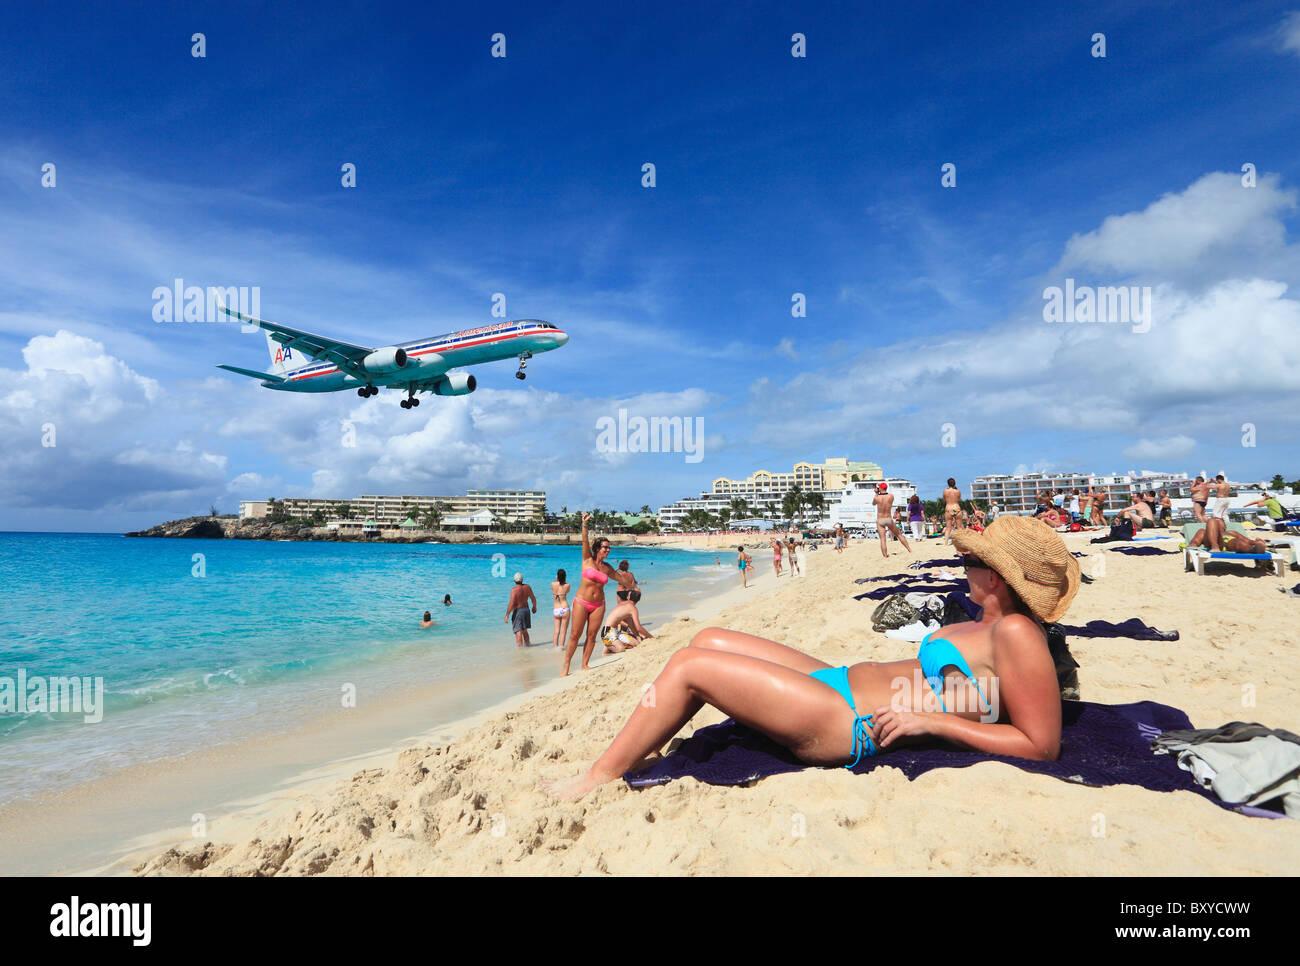 American Airlines Jet sbarco attraverso la Maho beach a St.Maarten Princess Juliana Airport Immagini Stock